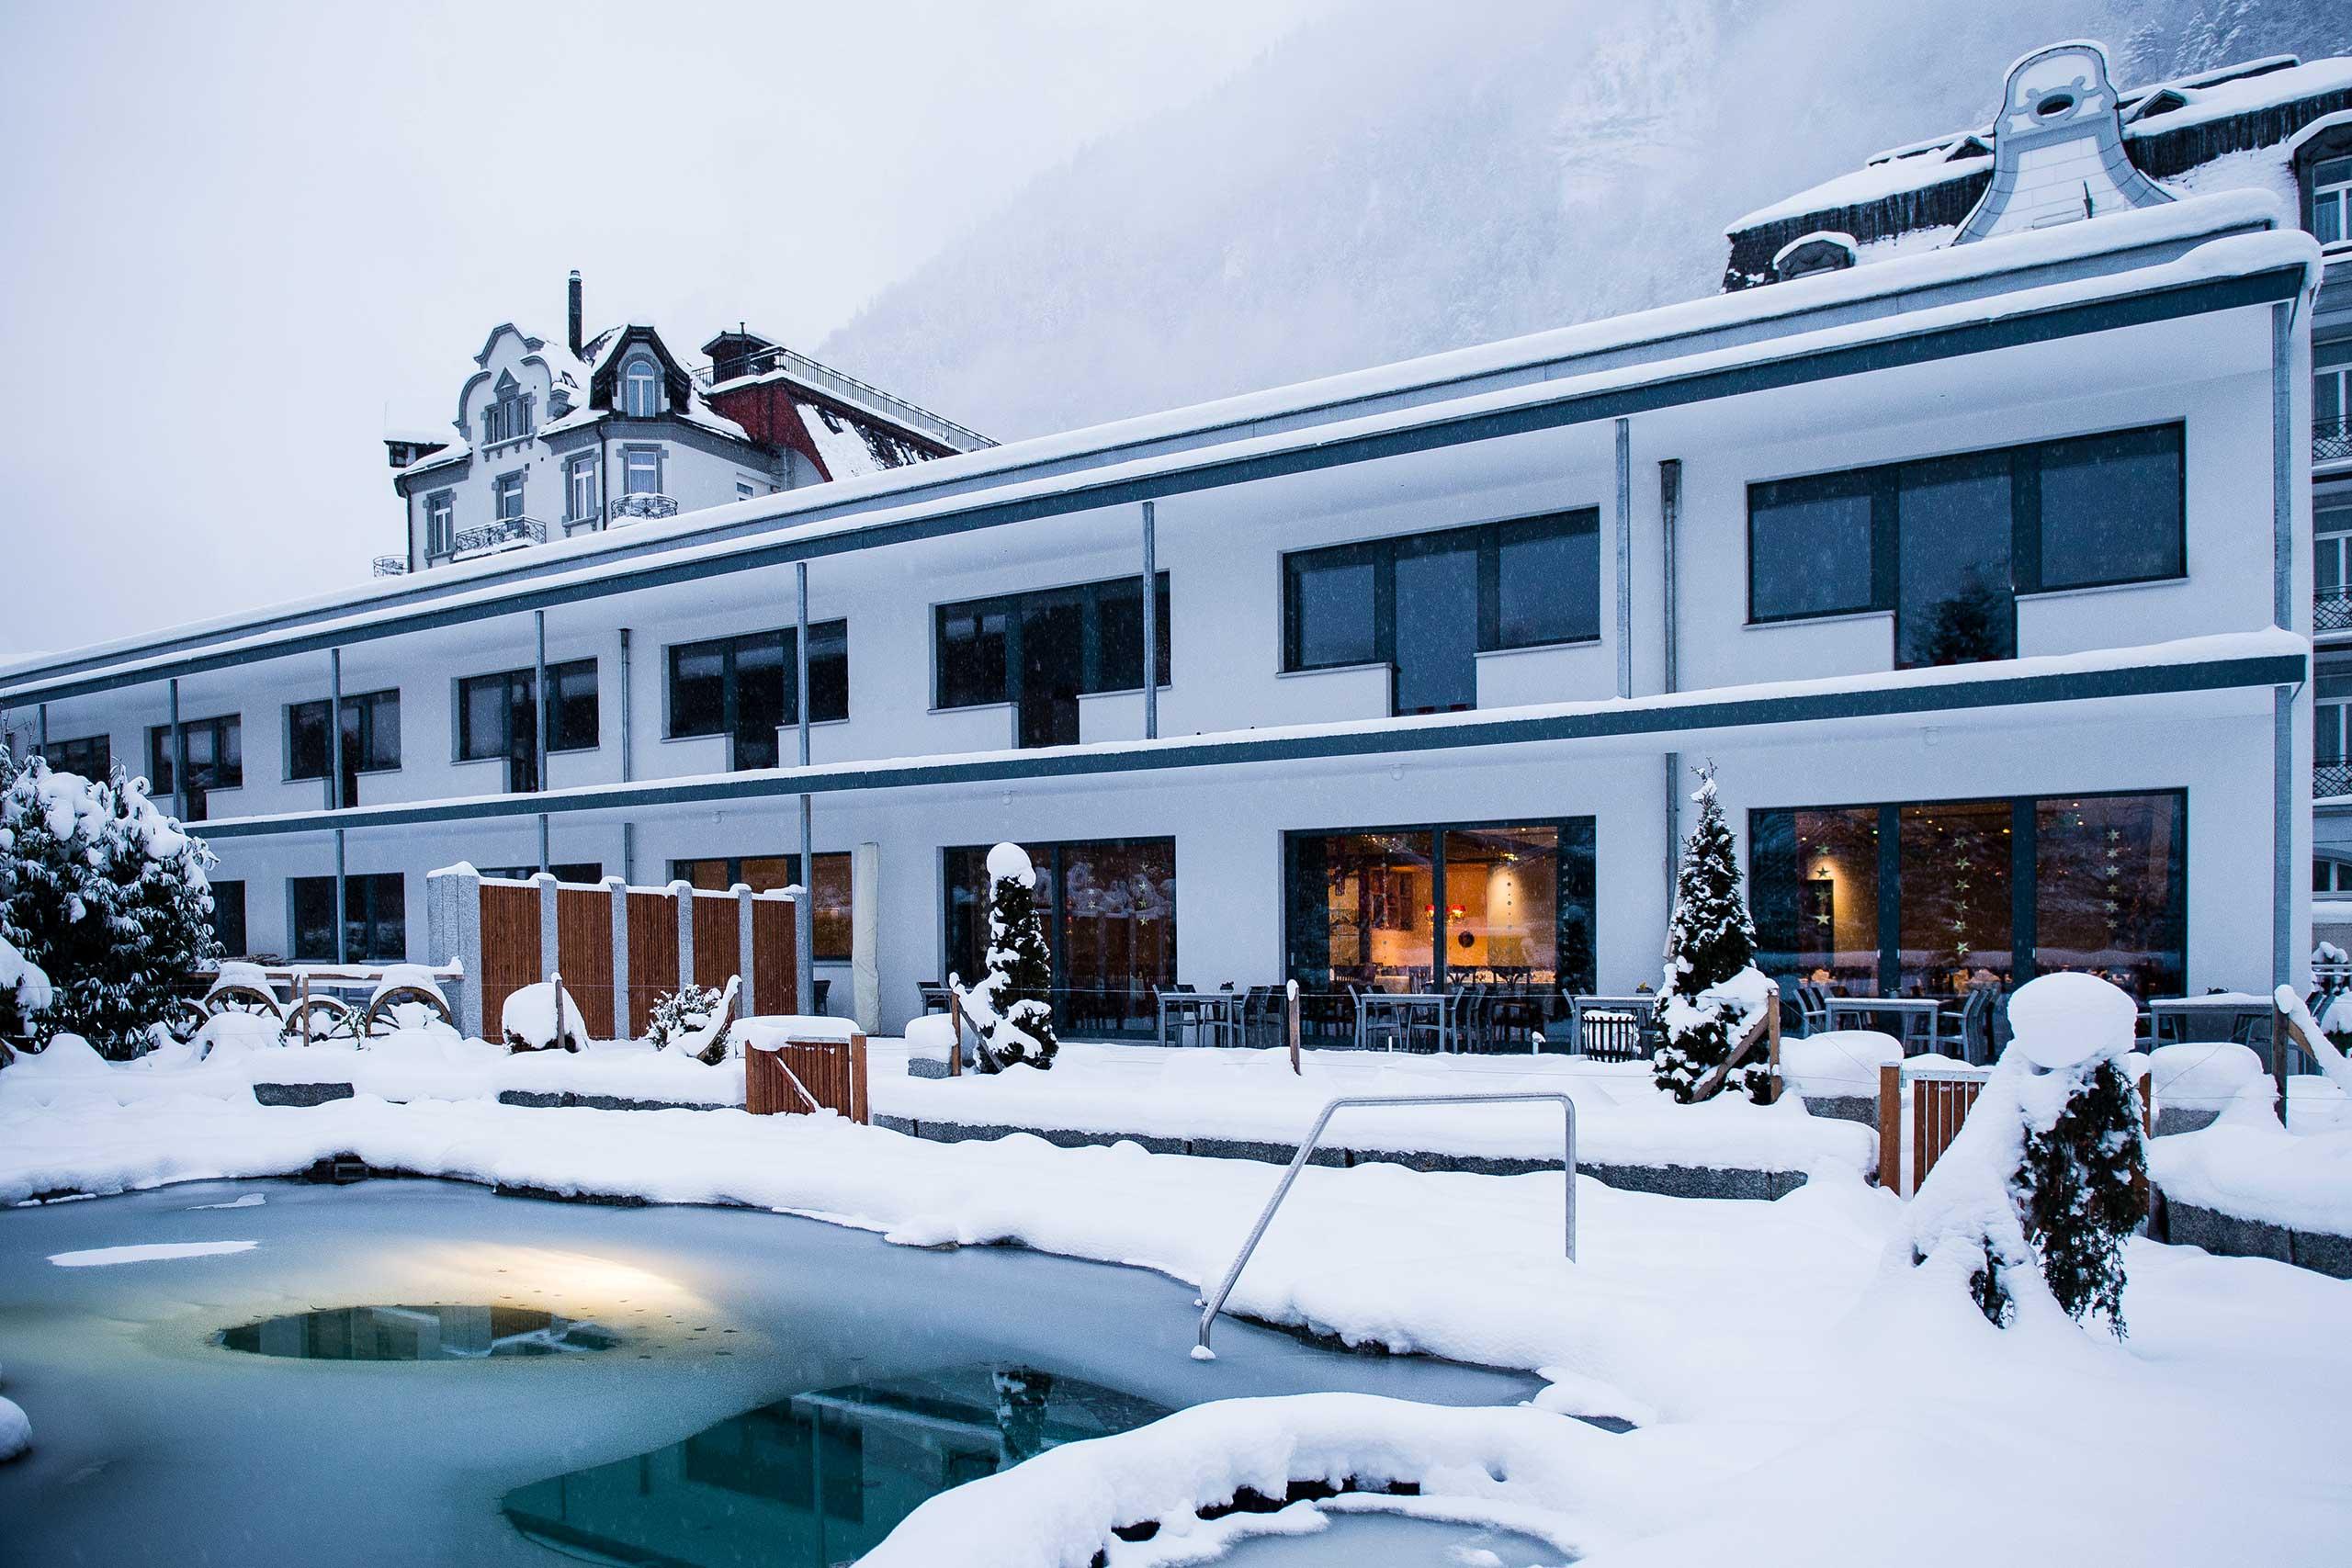 carlton-europe-gebaeude-pool-winter.jpg